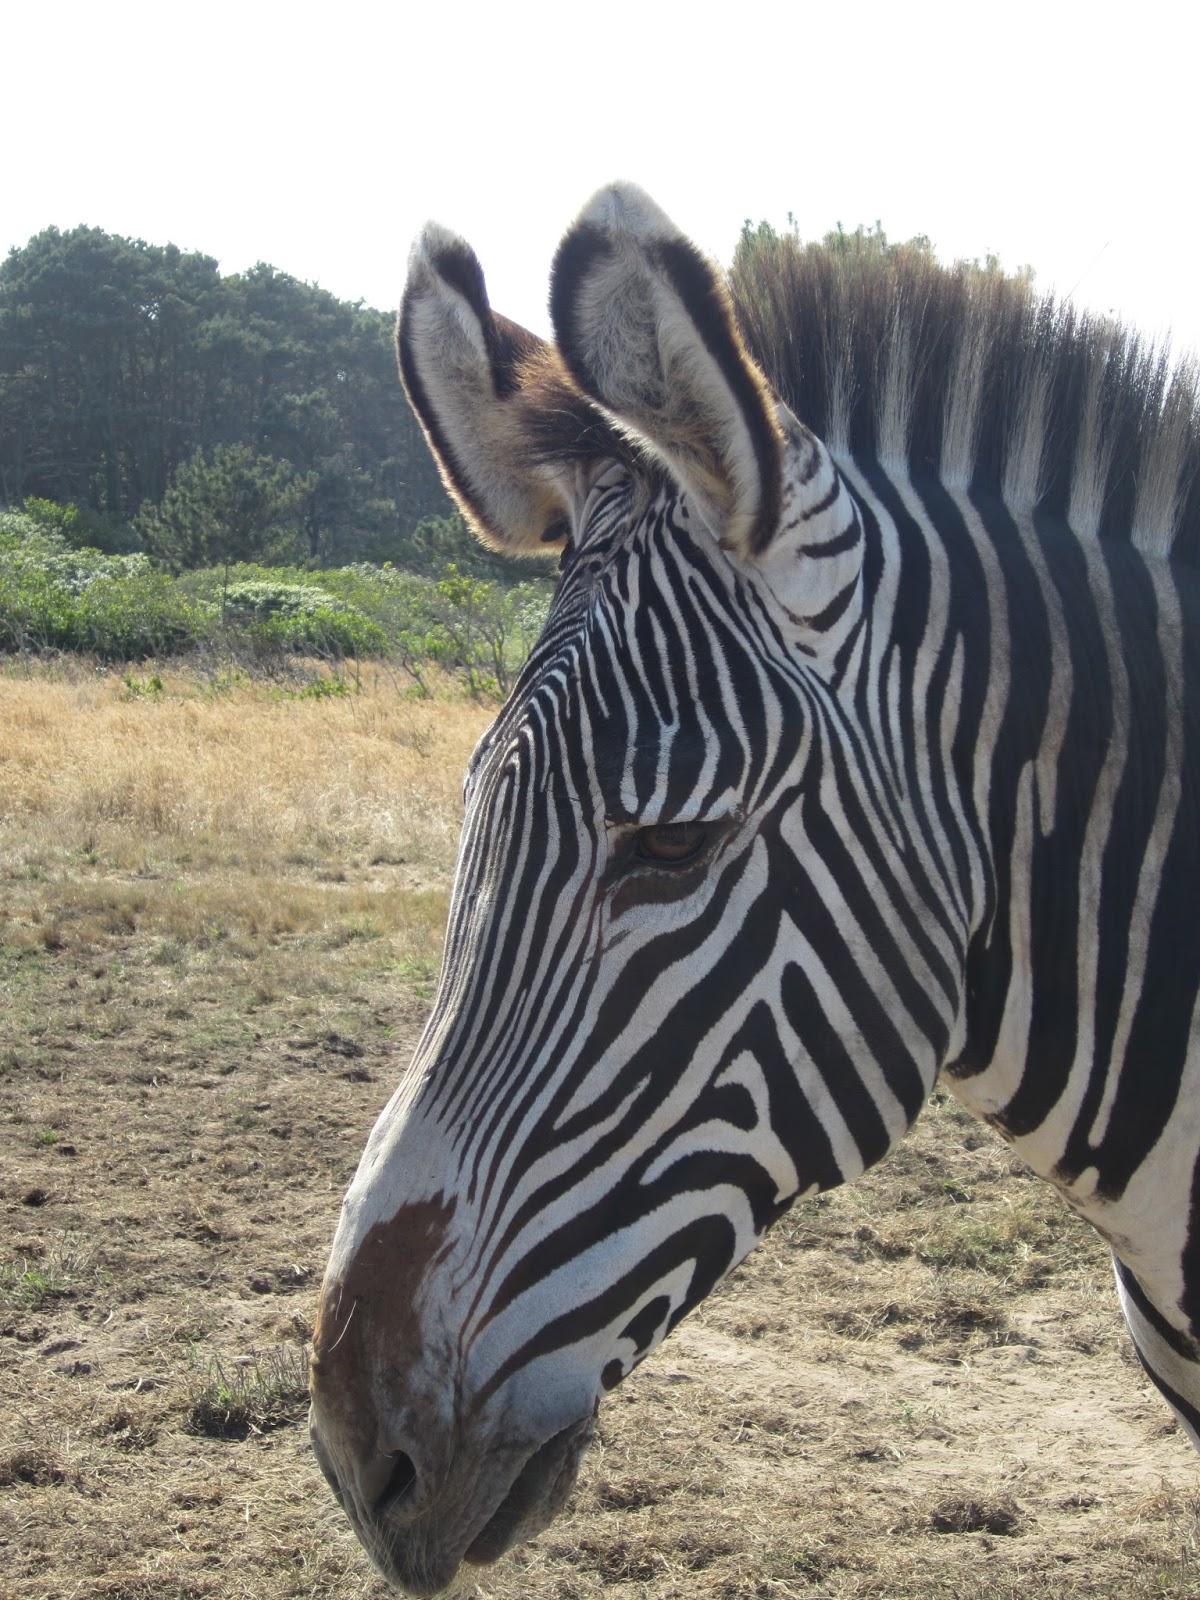 Green Bag Lady Giraffes Zebras In California